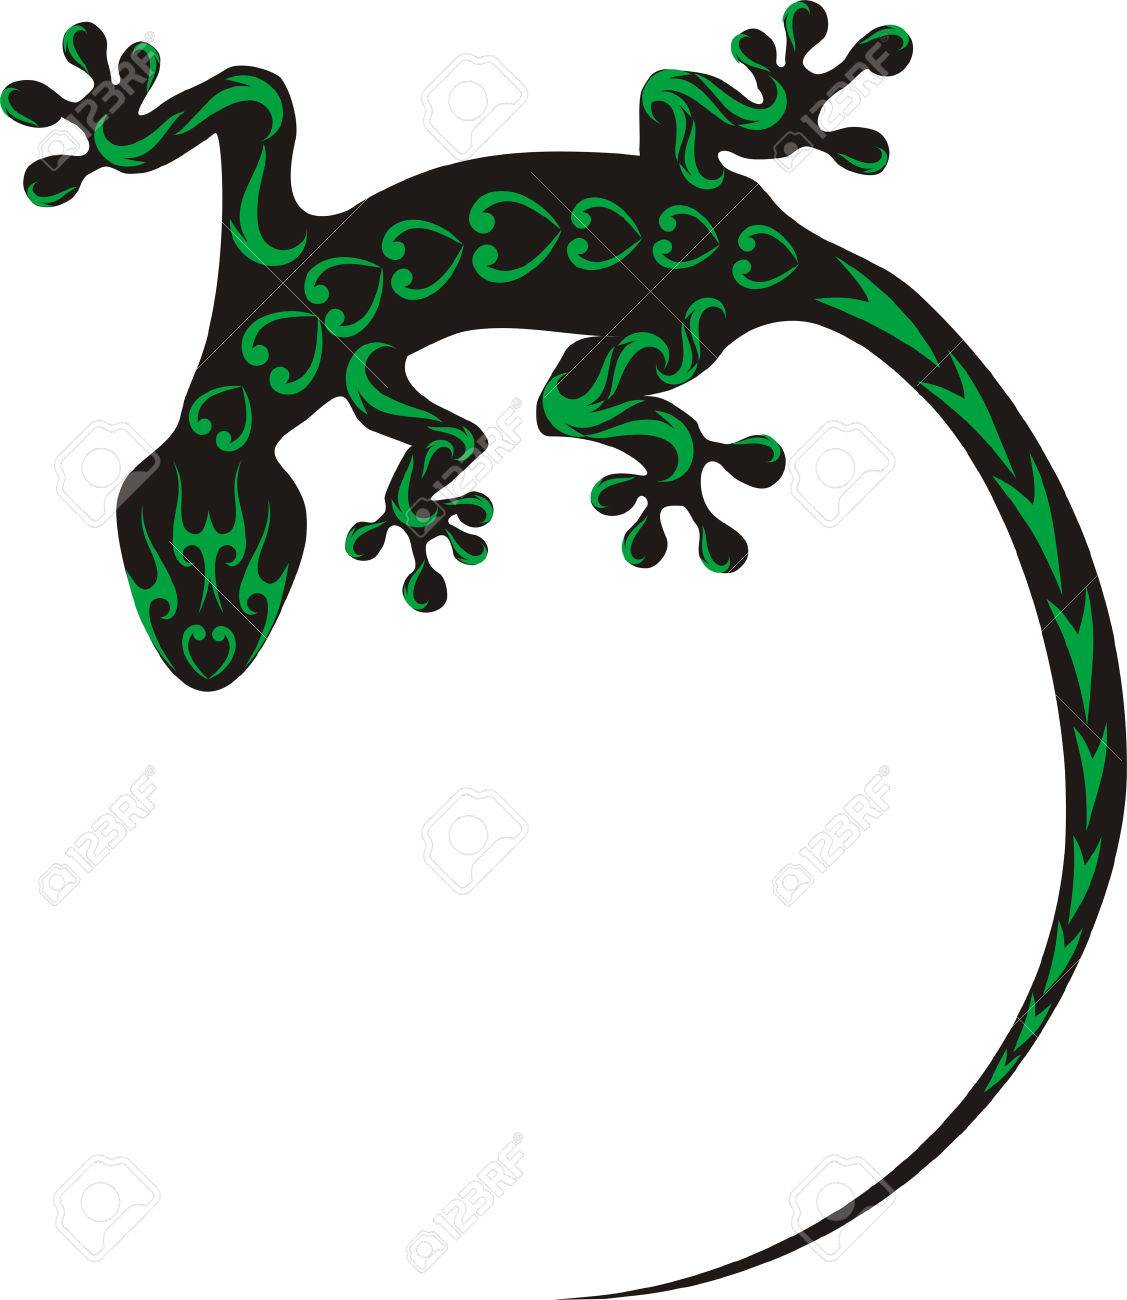 1127x1300 Gecko Clipart Tribal Animal